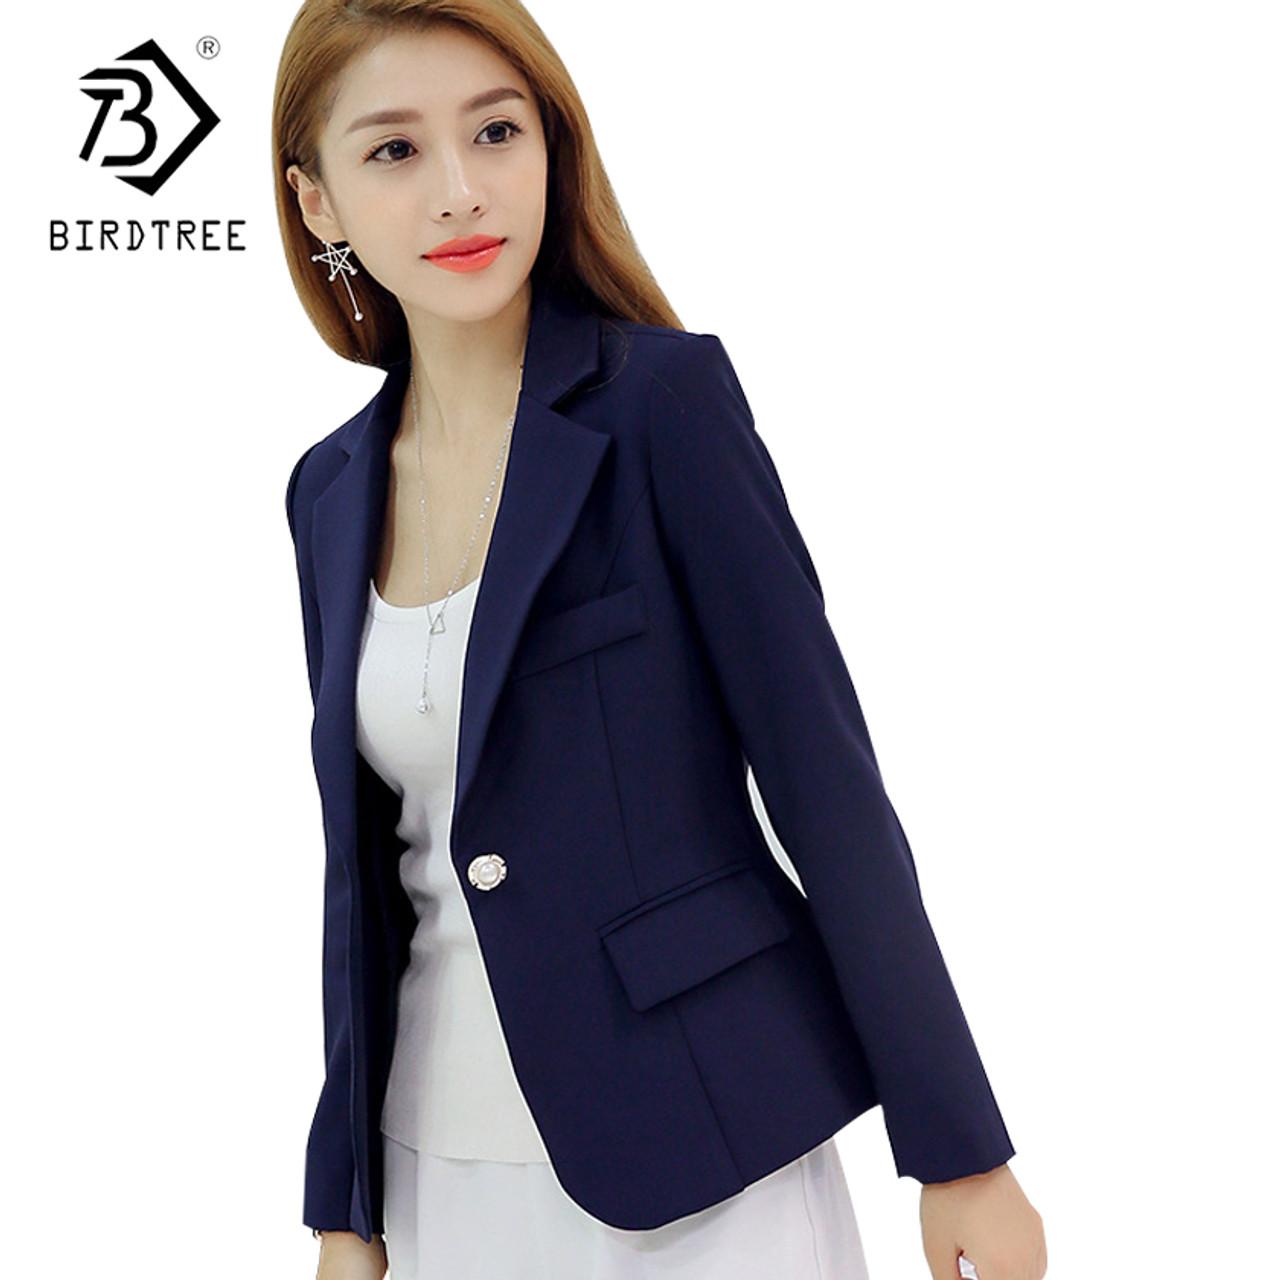 48f98b5031ca 2018 New Fashion Basic Jacket Blazer Women Navy Burgundy Suit Ladies Spring  One Button Brand Coats ...